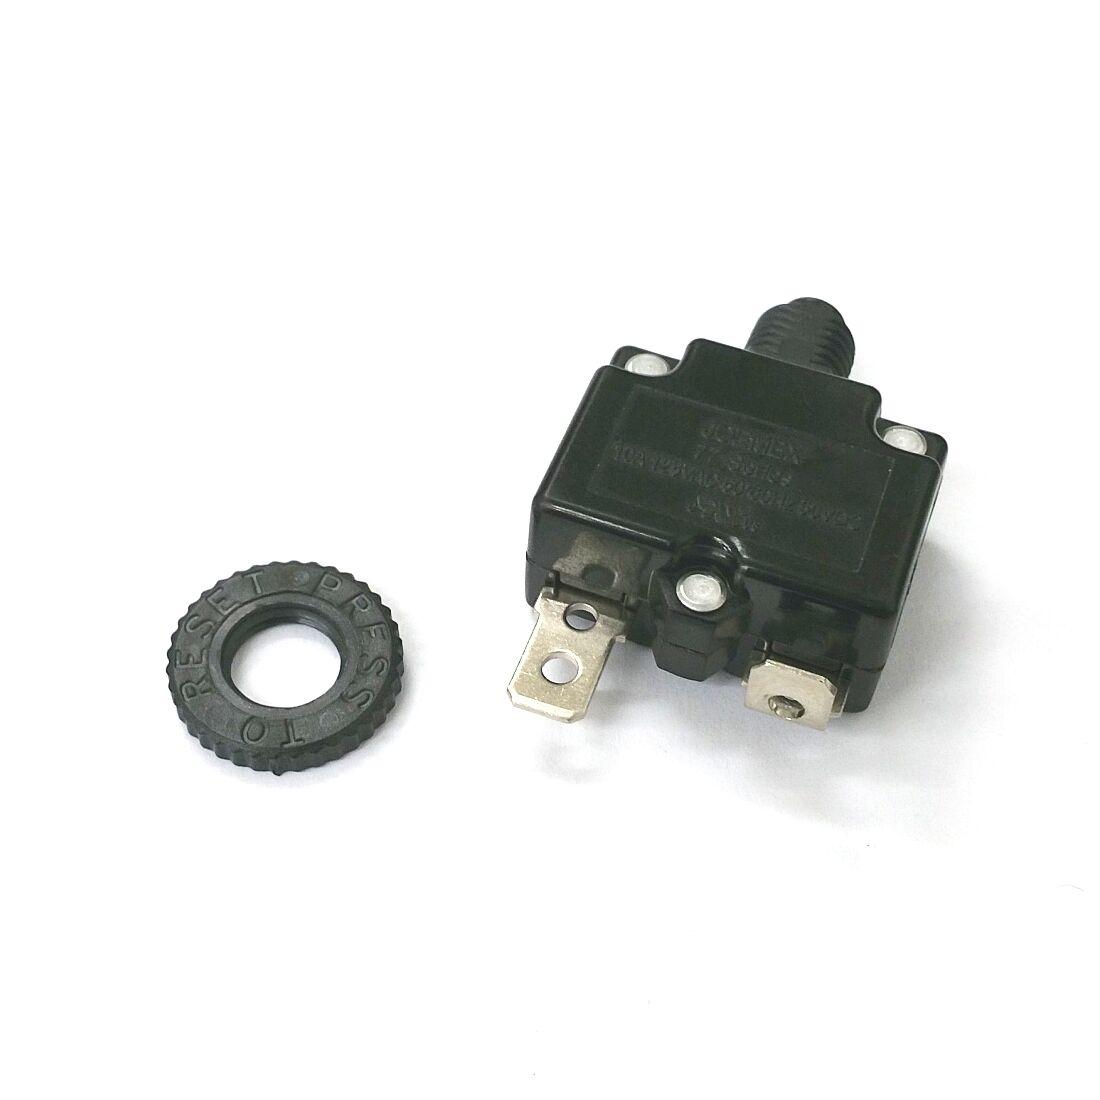 NEW 7 Amp Miniature Pushbutton Circuit Breaker Qty 5